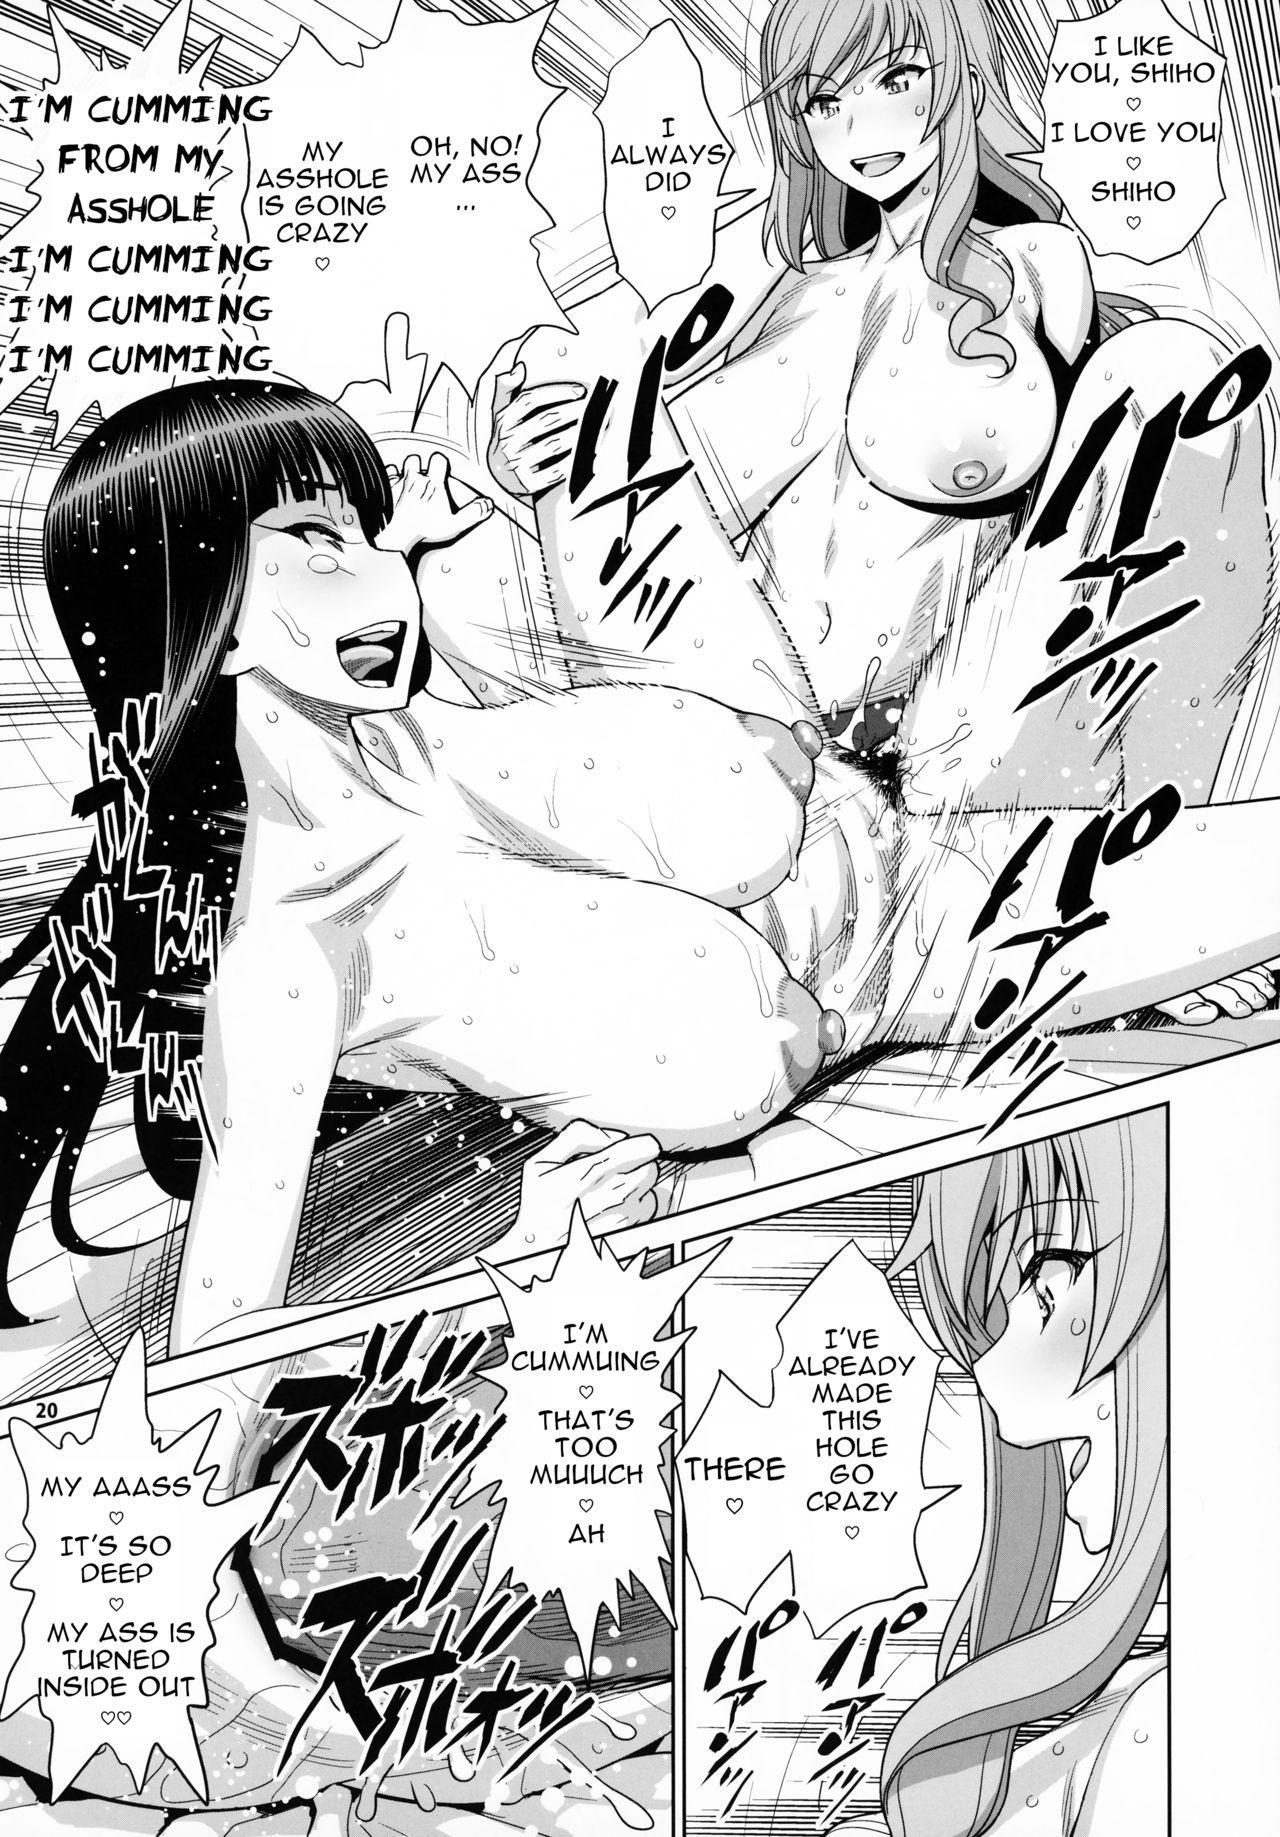 (COMIC1☆15) [Gerupin (Minazuki Juuzou, USSO)] Shimada-ryuu VS Nishizumi-ryuu Bijukujo Lesbian Kyokugen Kougyaku Gurui | Shimada Style VS Nishizumi Style MILF Lesbian Extreme Anal Fetish (Girls und Panzer) [English] 18